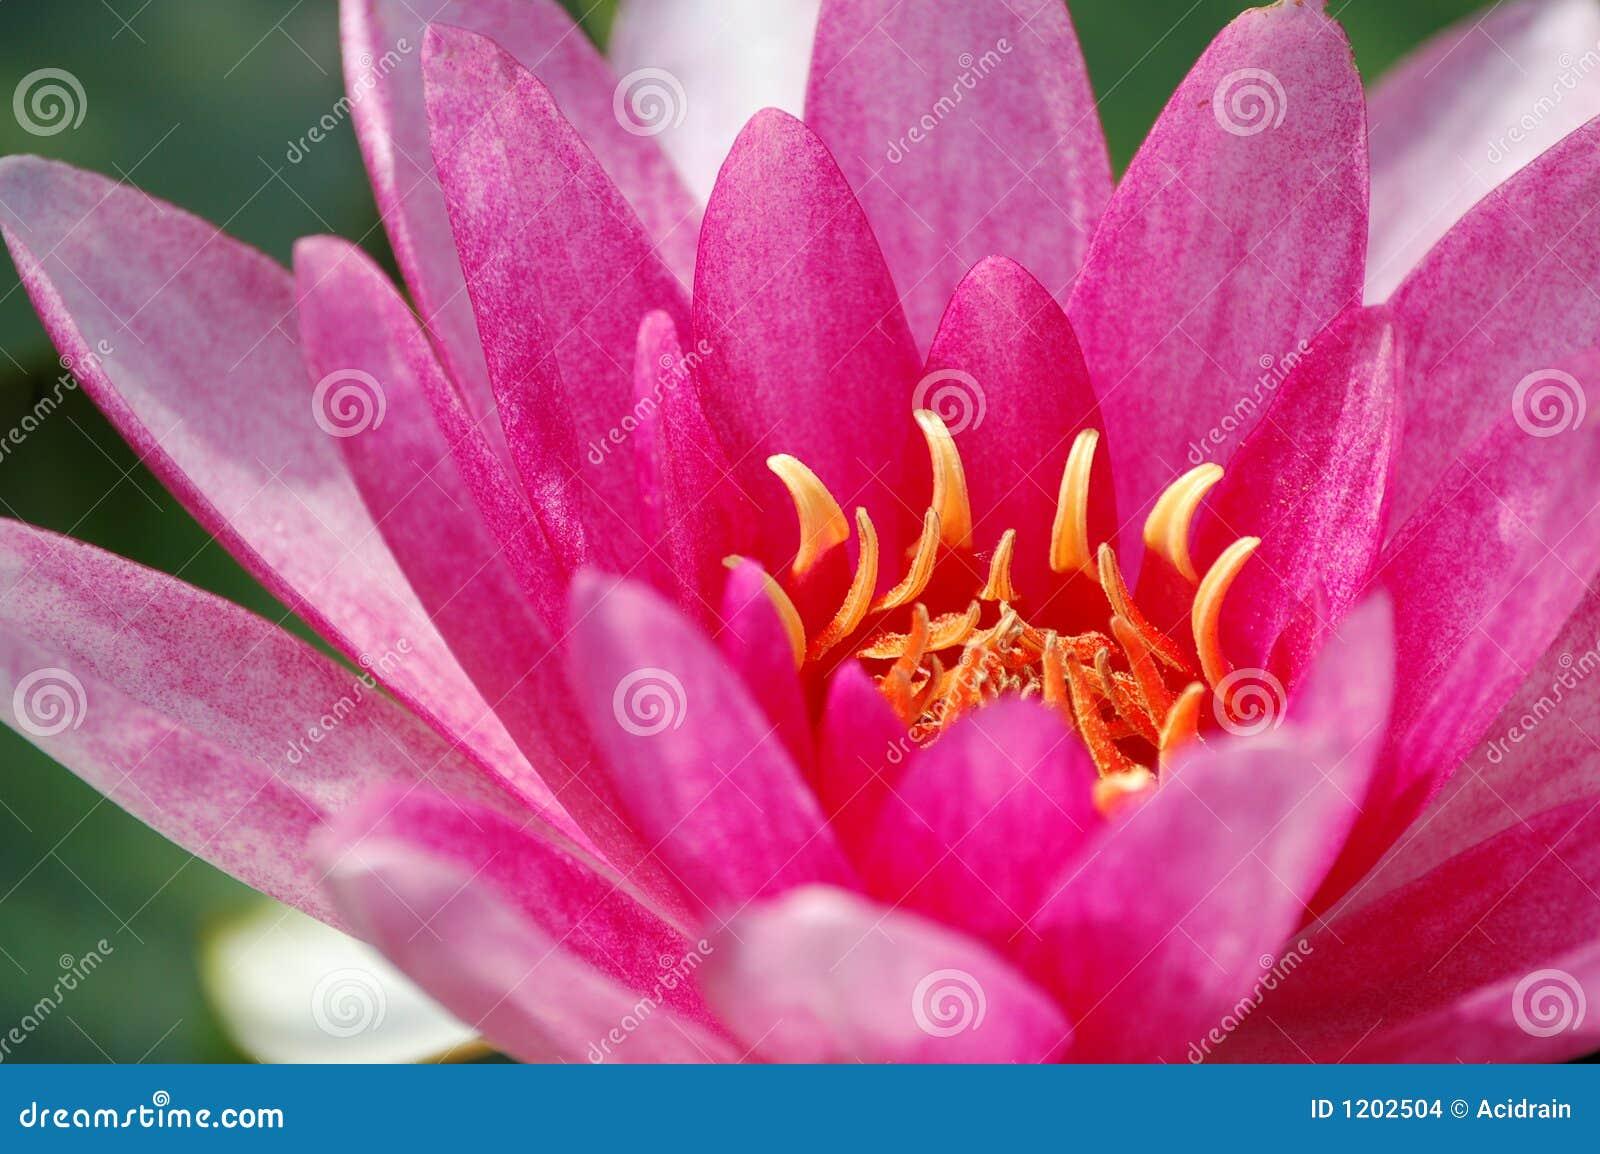 Water lily closeup